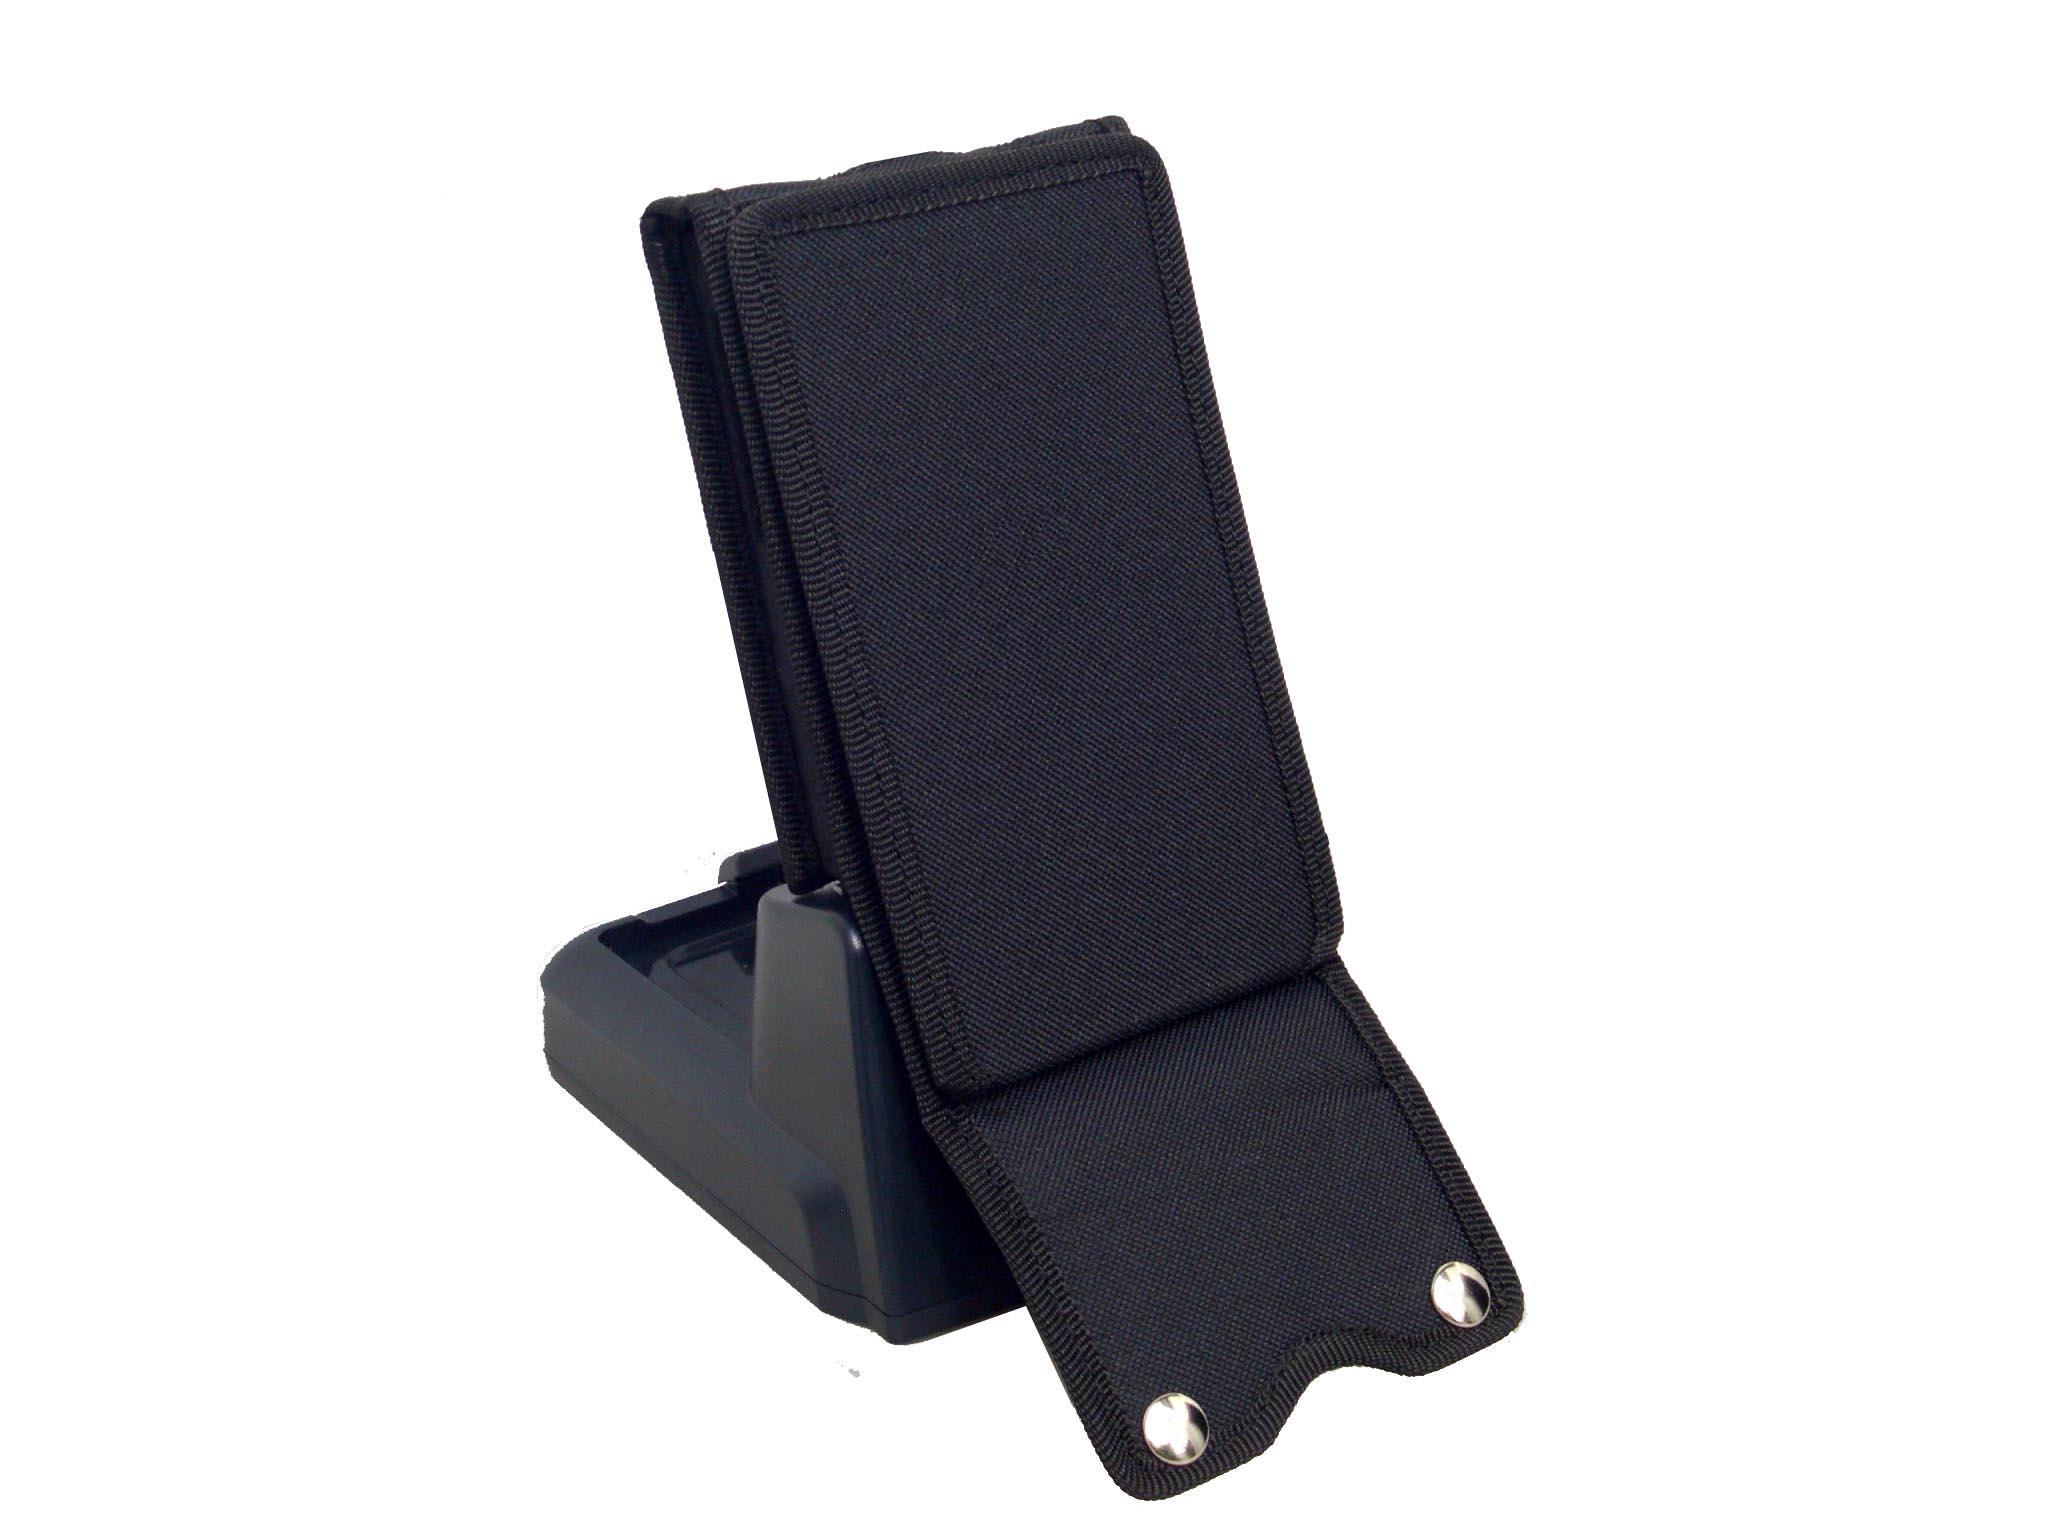 Honeywell-Dolphin-CT50-Case-base